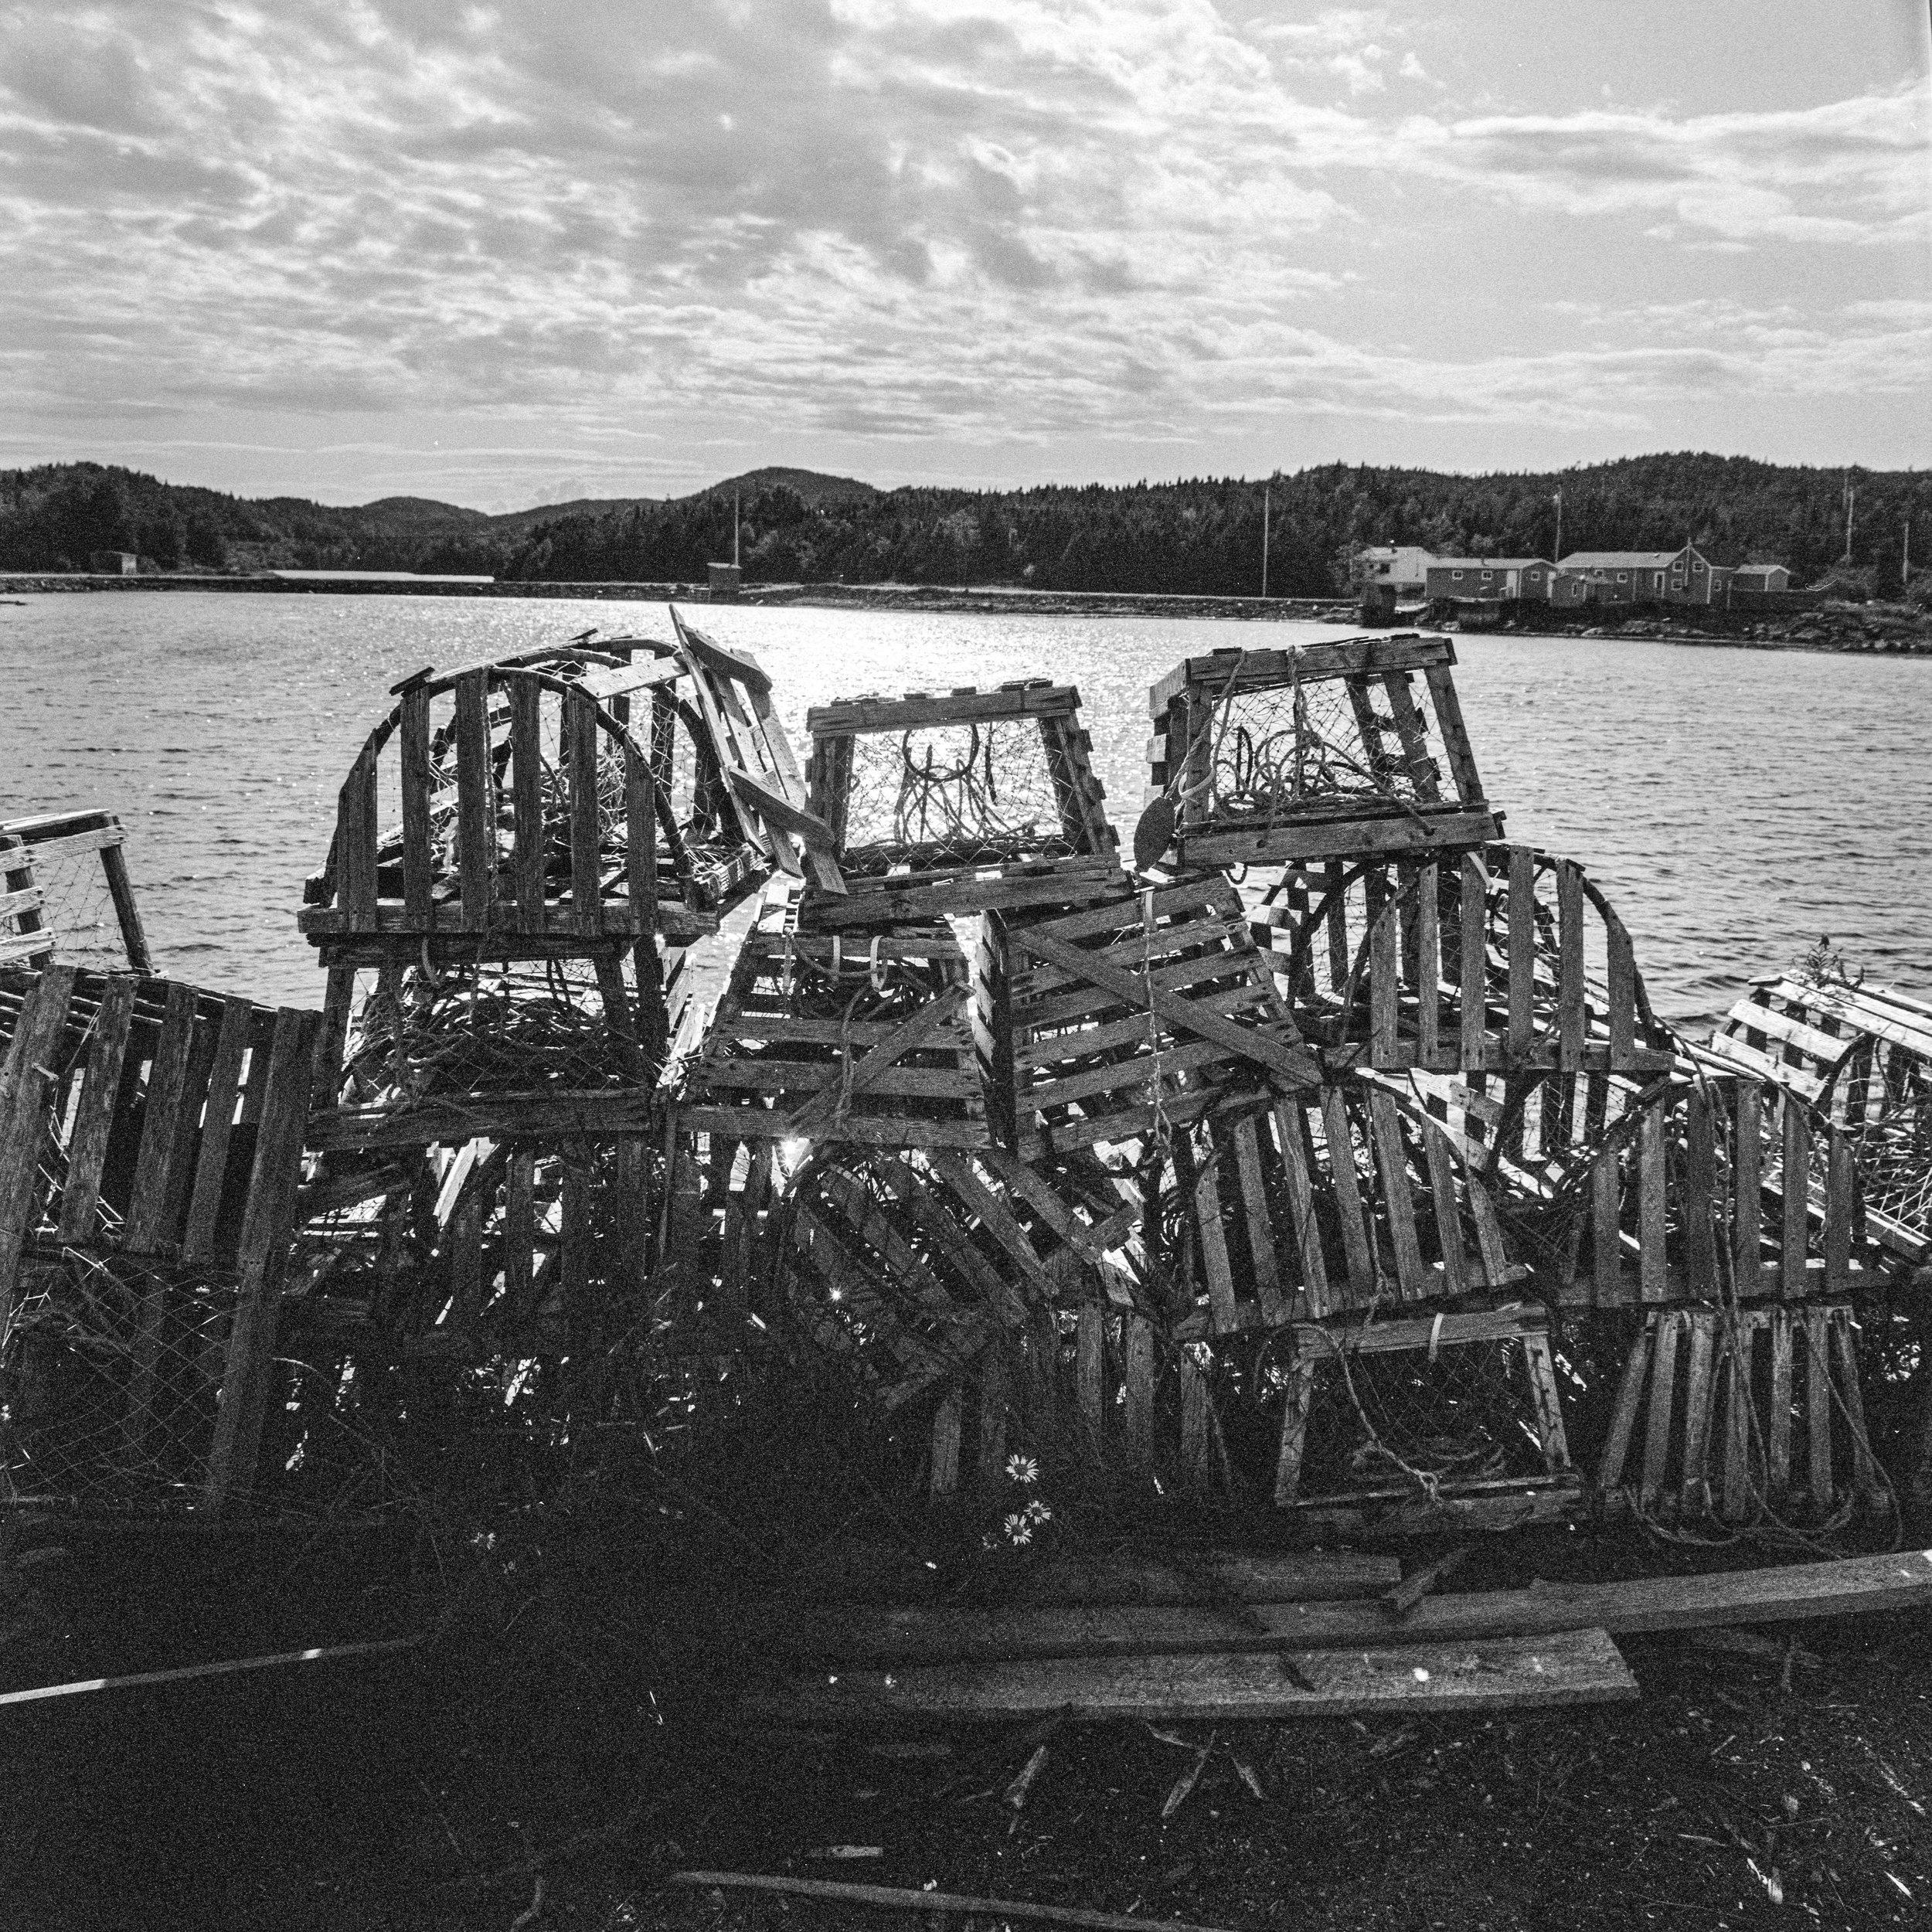 Lobster traps, Cobbs Arm, Newfoundland